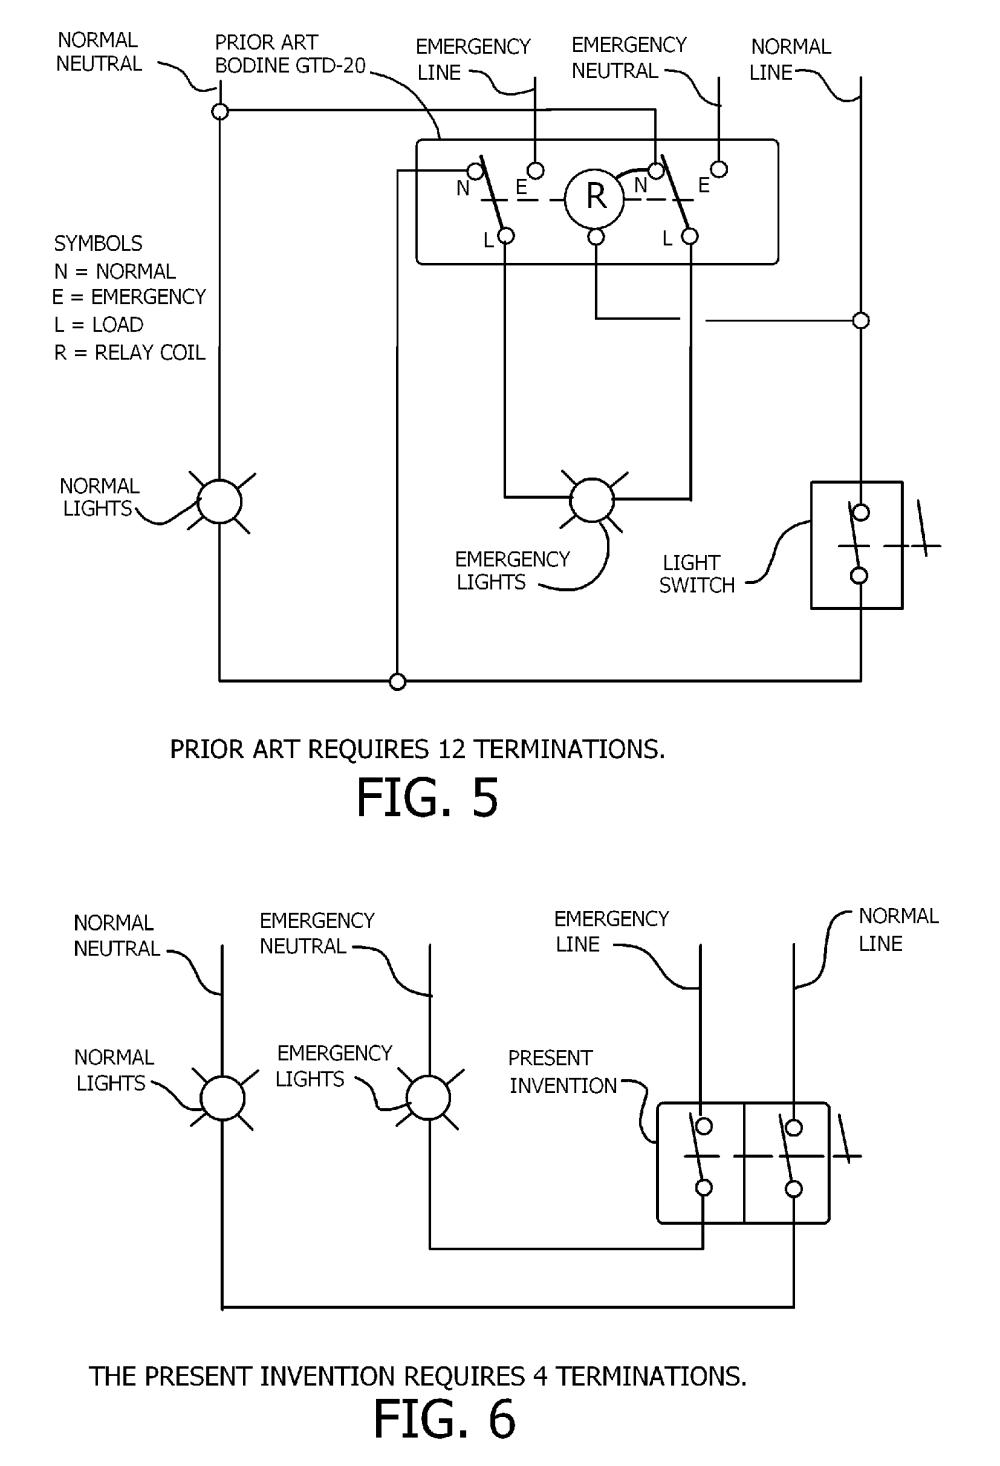 medium resolution of bodine gtd wiring diagram 25 wiring diagram images bodine emergency lighting wiring diagrams bodine emergency ballast